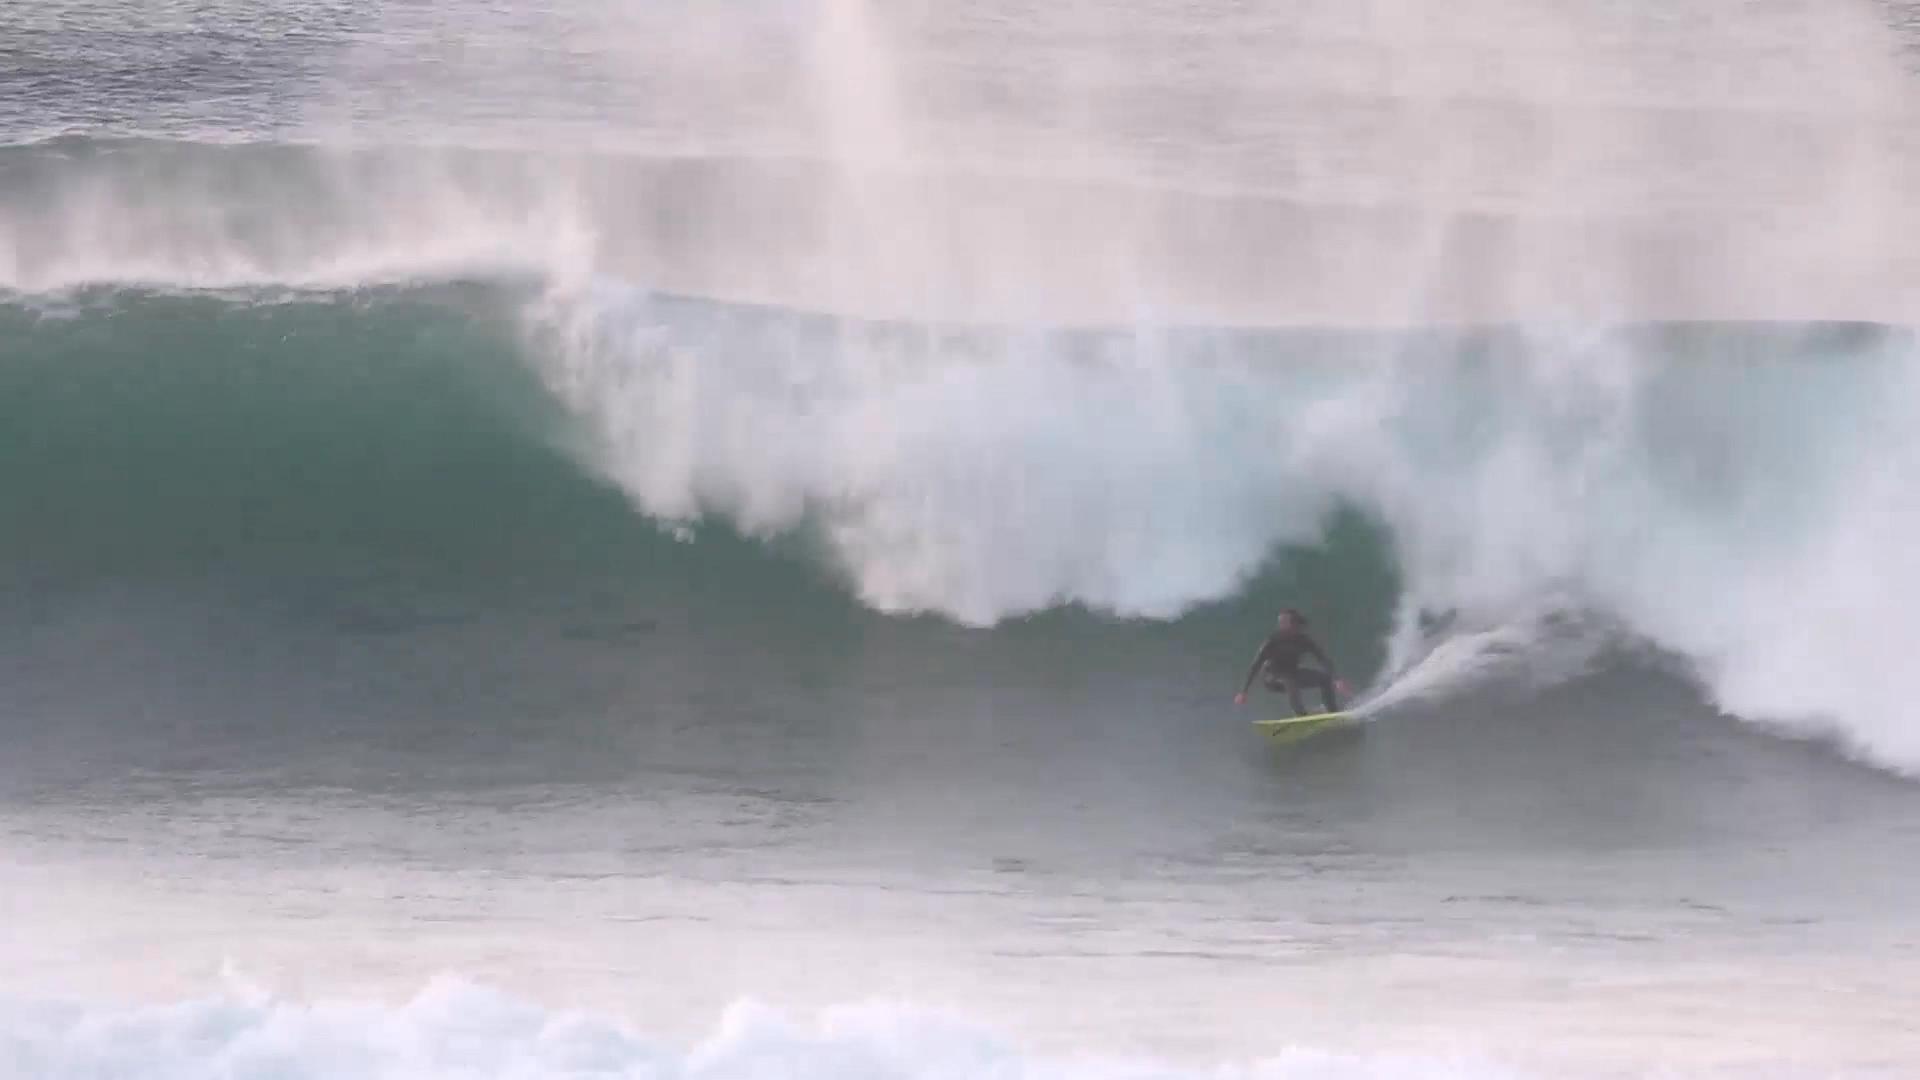 Big Wave in the Basque Country Ingles, with Laurels. Azkena Carrascon.MP4.Imagen fija007.jpg